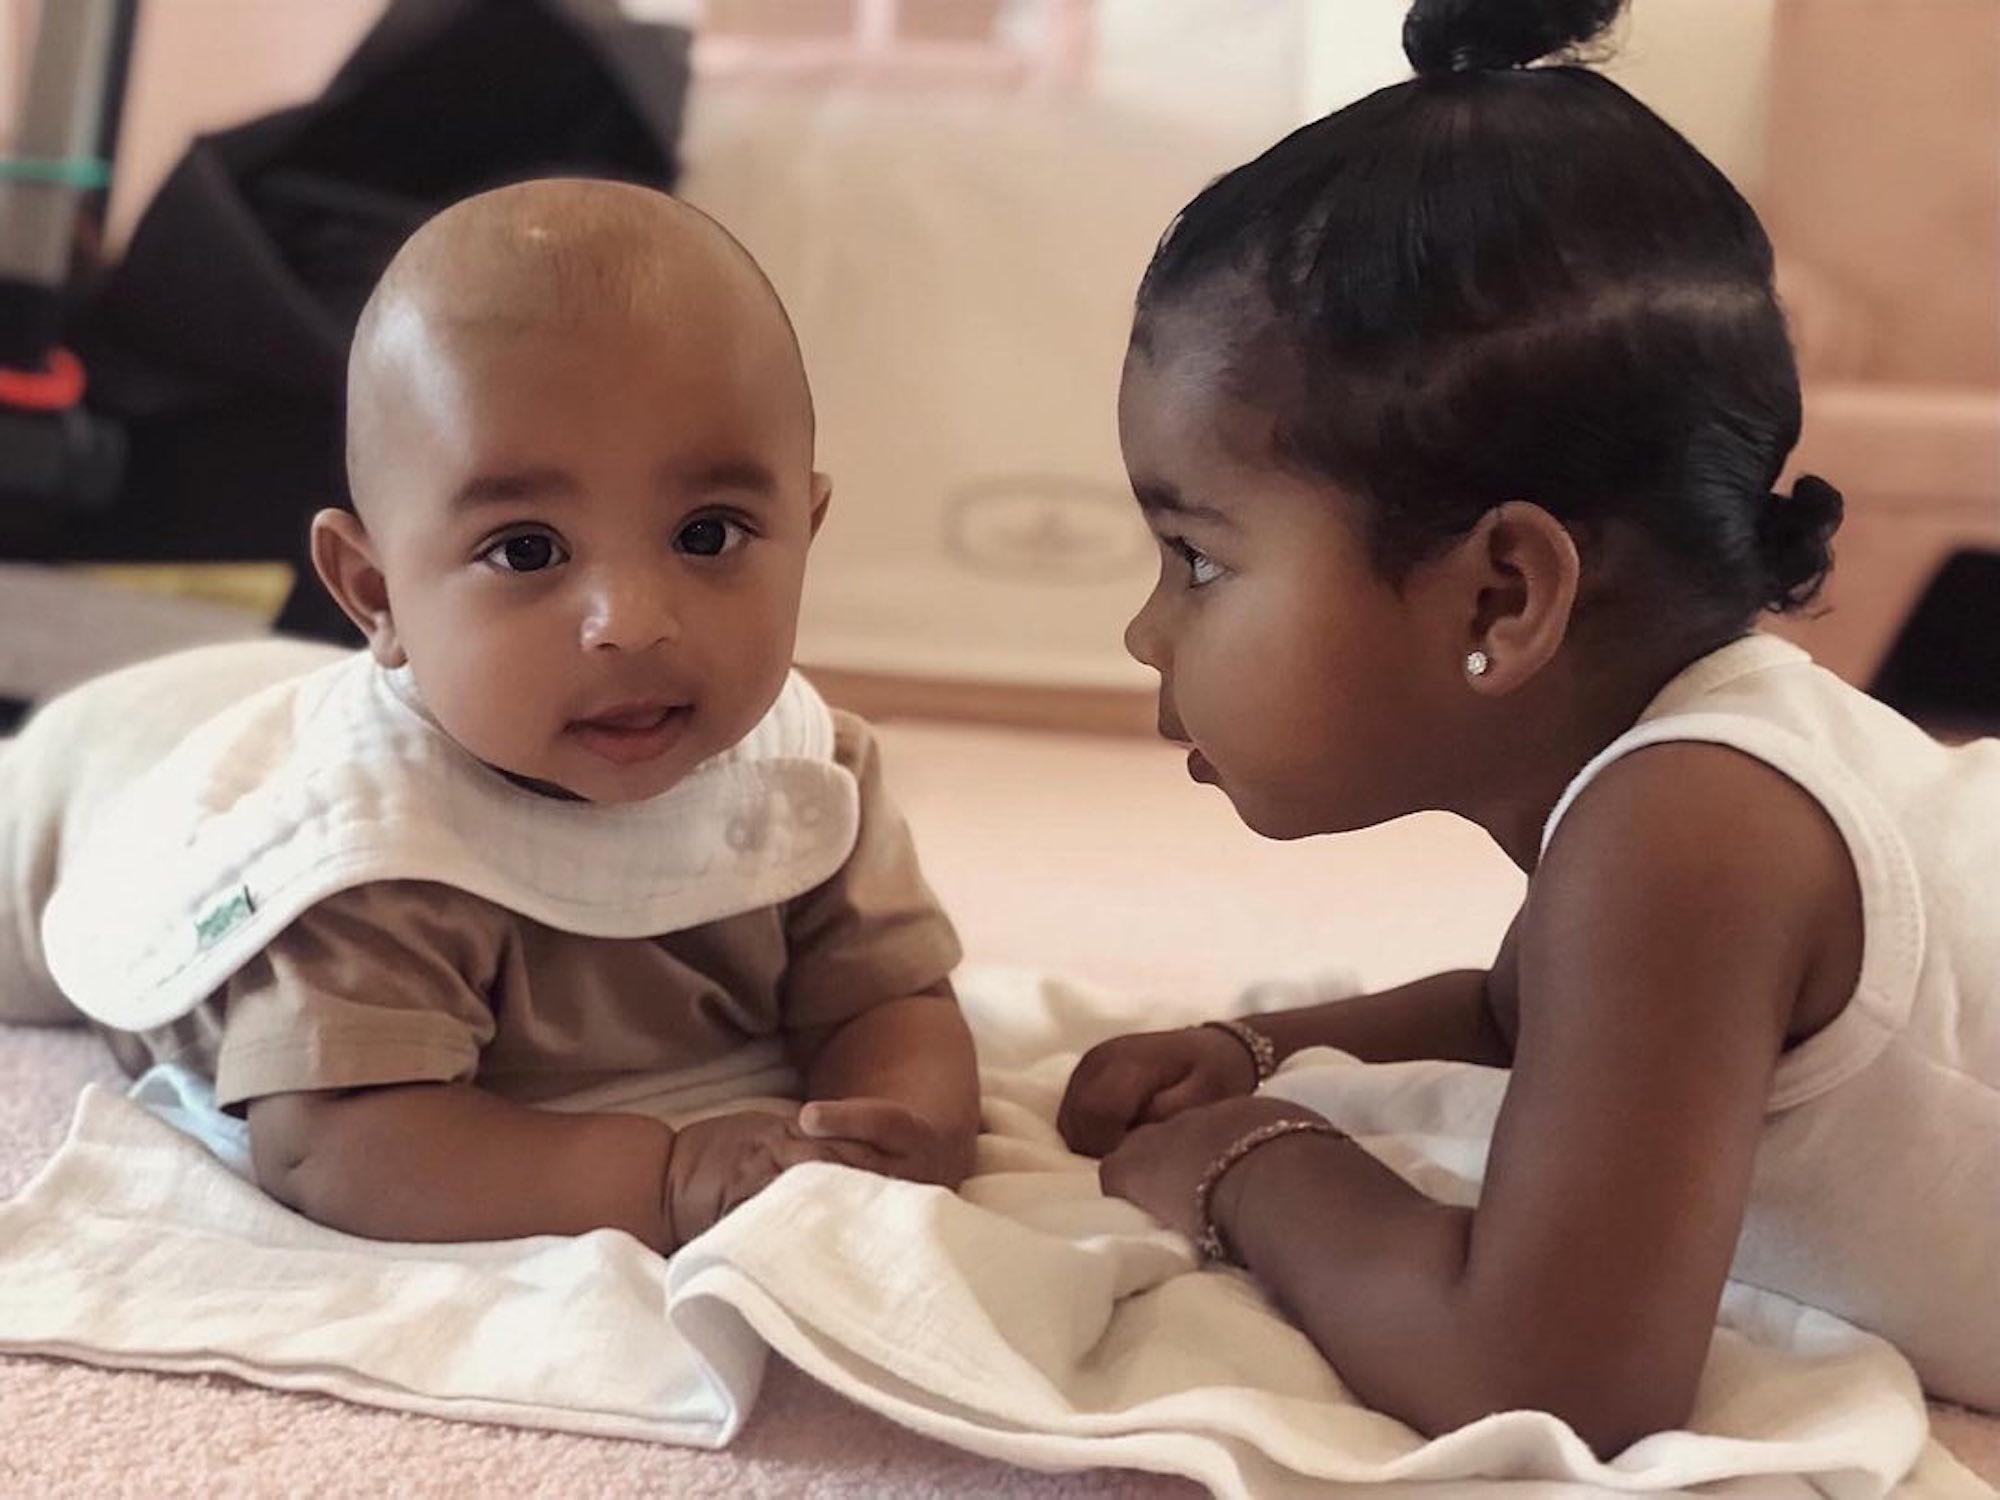 Baby Fever Alert! Kim Kardashian Shares New Photos of Psalm West Bonding With True Thompson: 'OBSESSED'